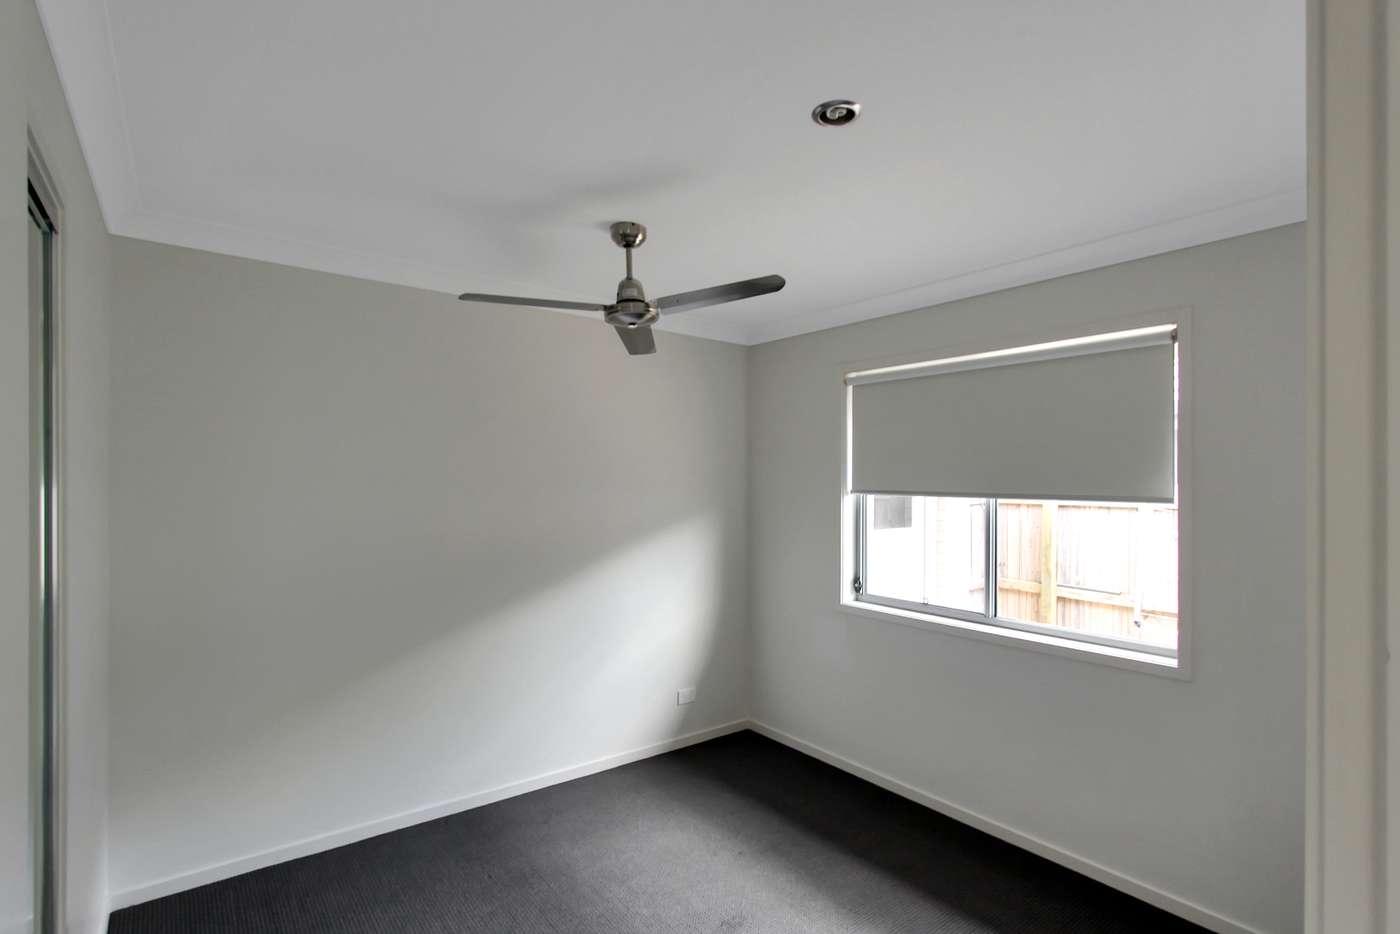 Seventh view of Homely house listing, 11 Bernard Circuit, Yarrabilba QLD 4207